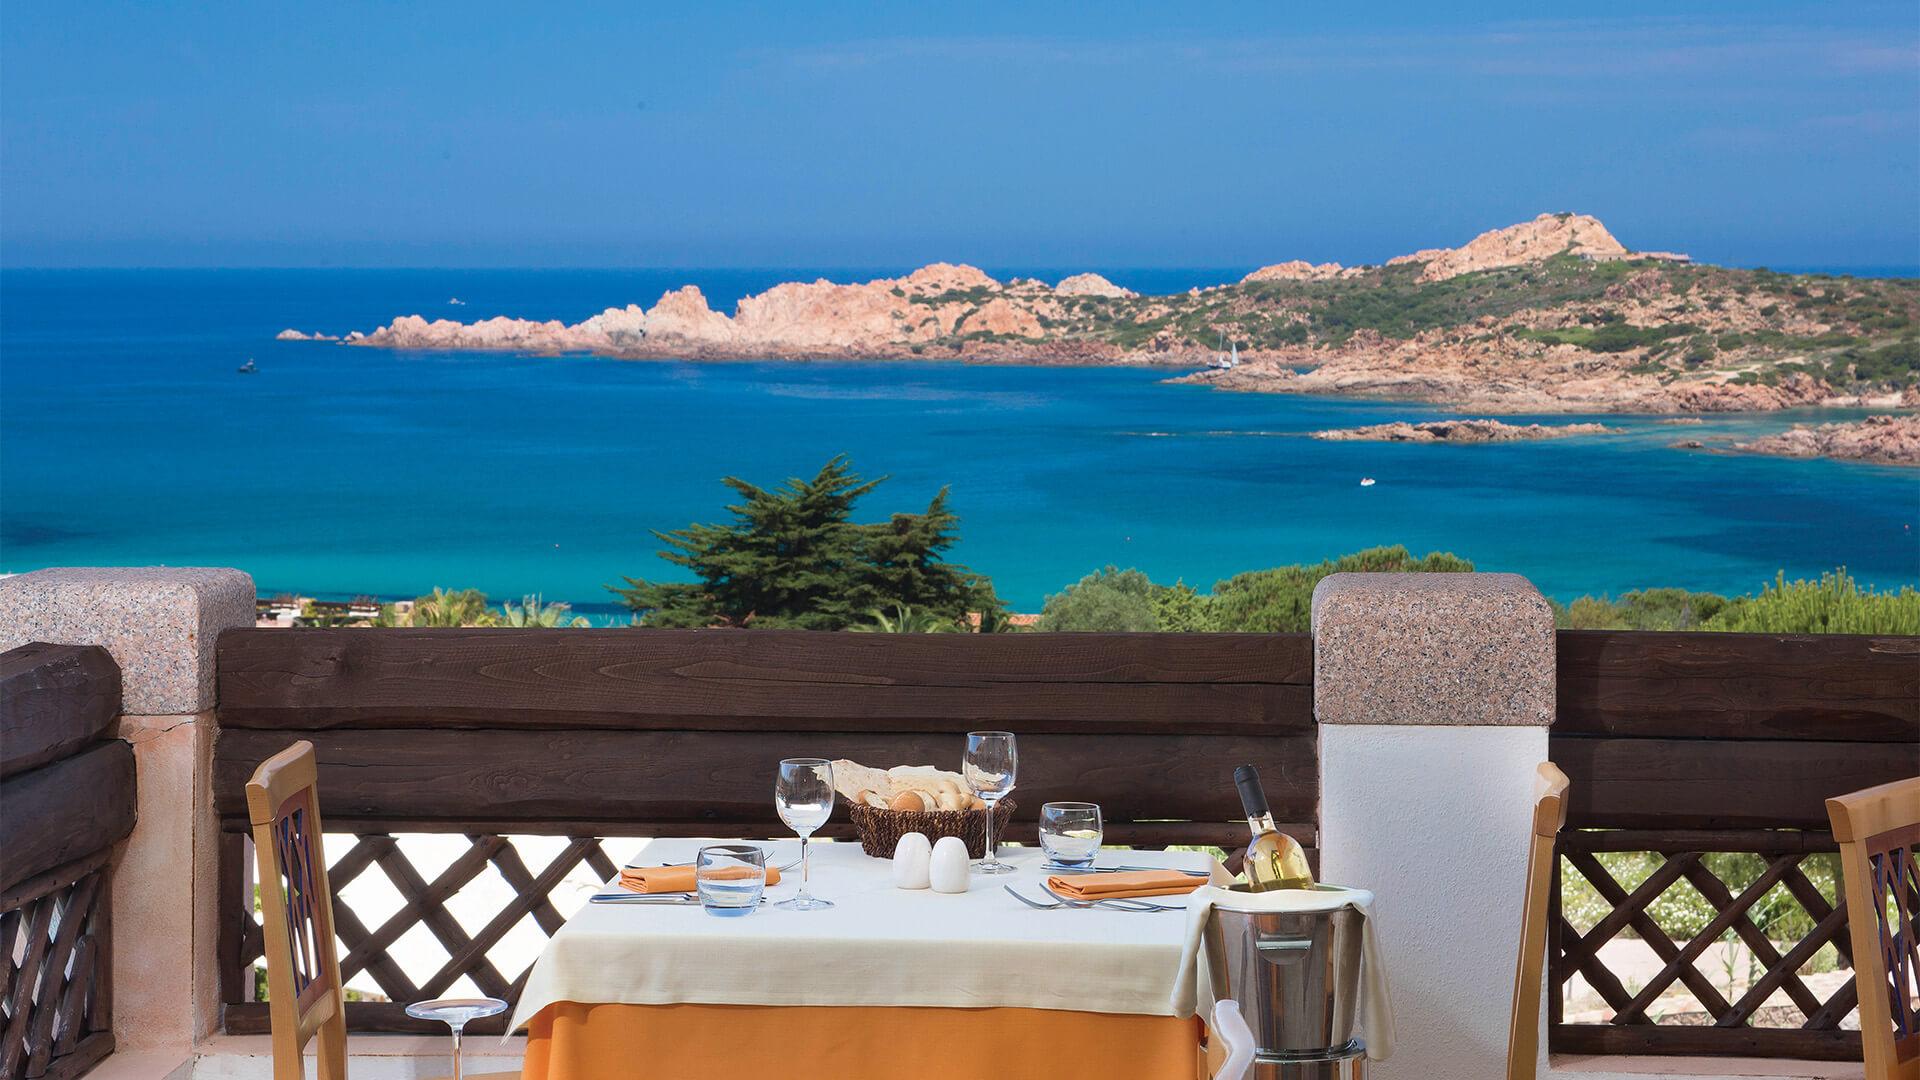 hotel-marinedda-ristorante-petra-ruja